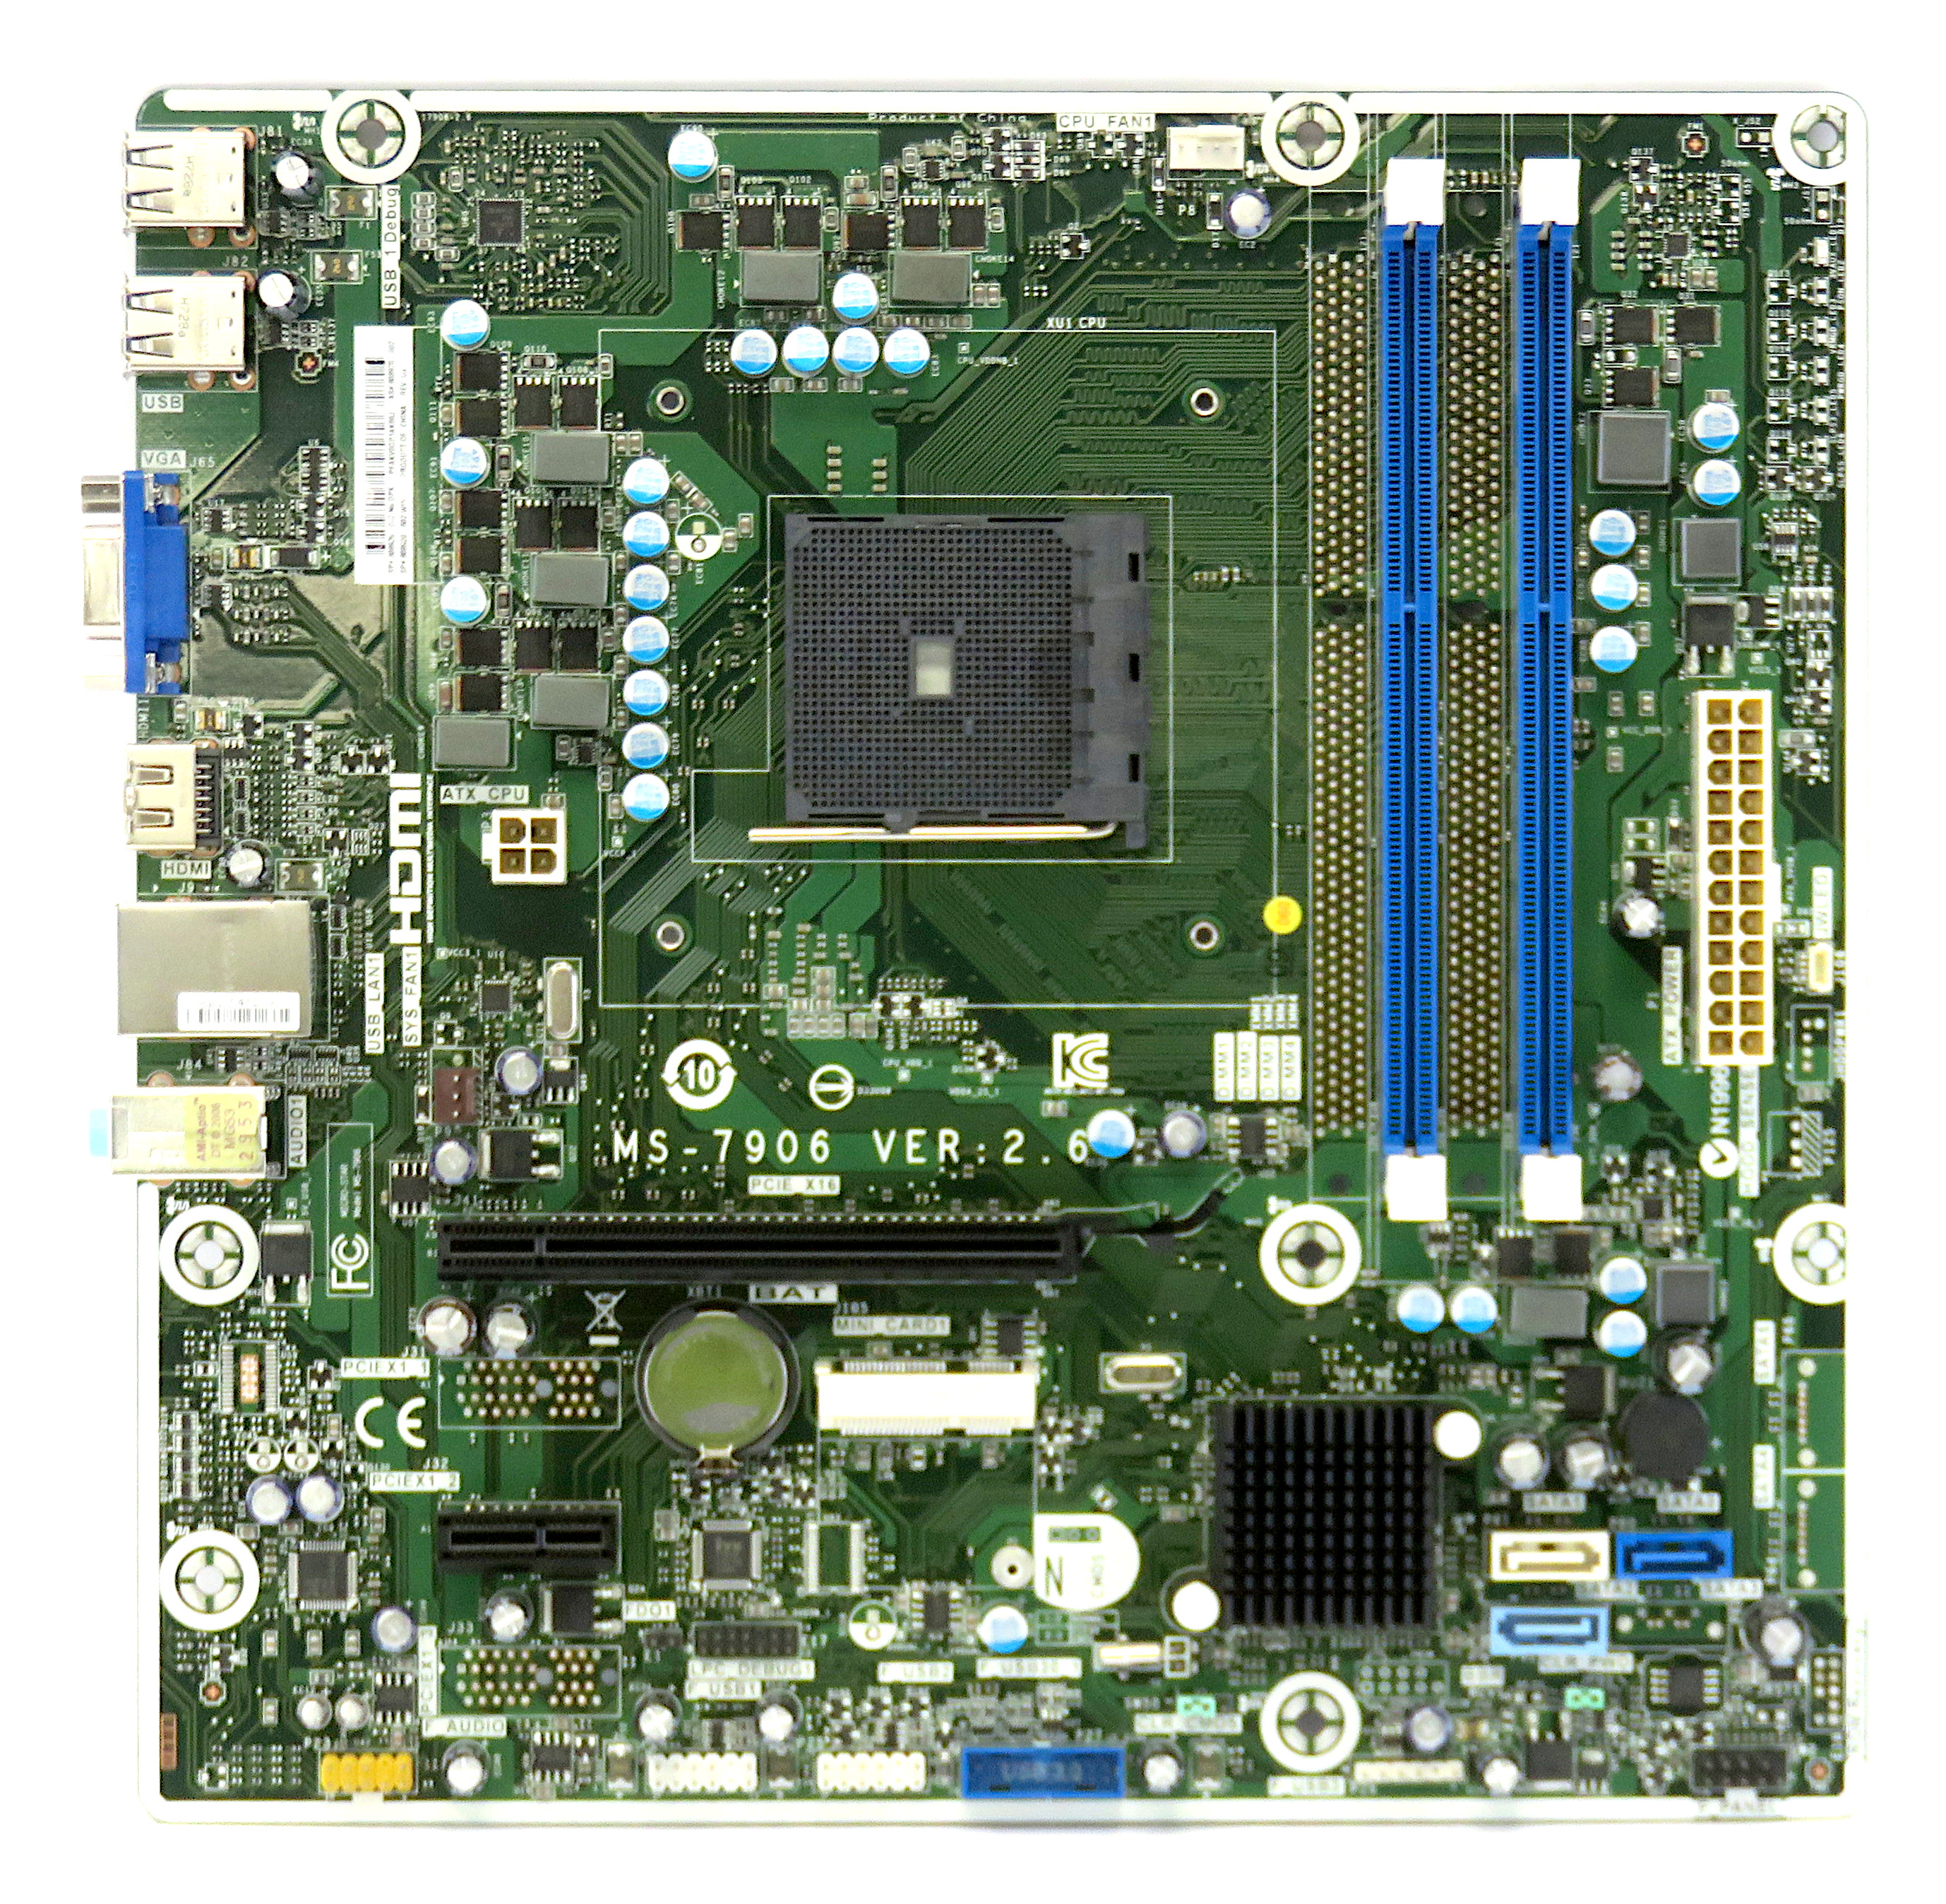 HP 808920-002 AMD Socket FM2b Motherboard MS-7906 VER:2.6